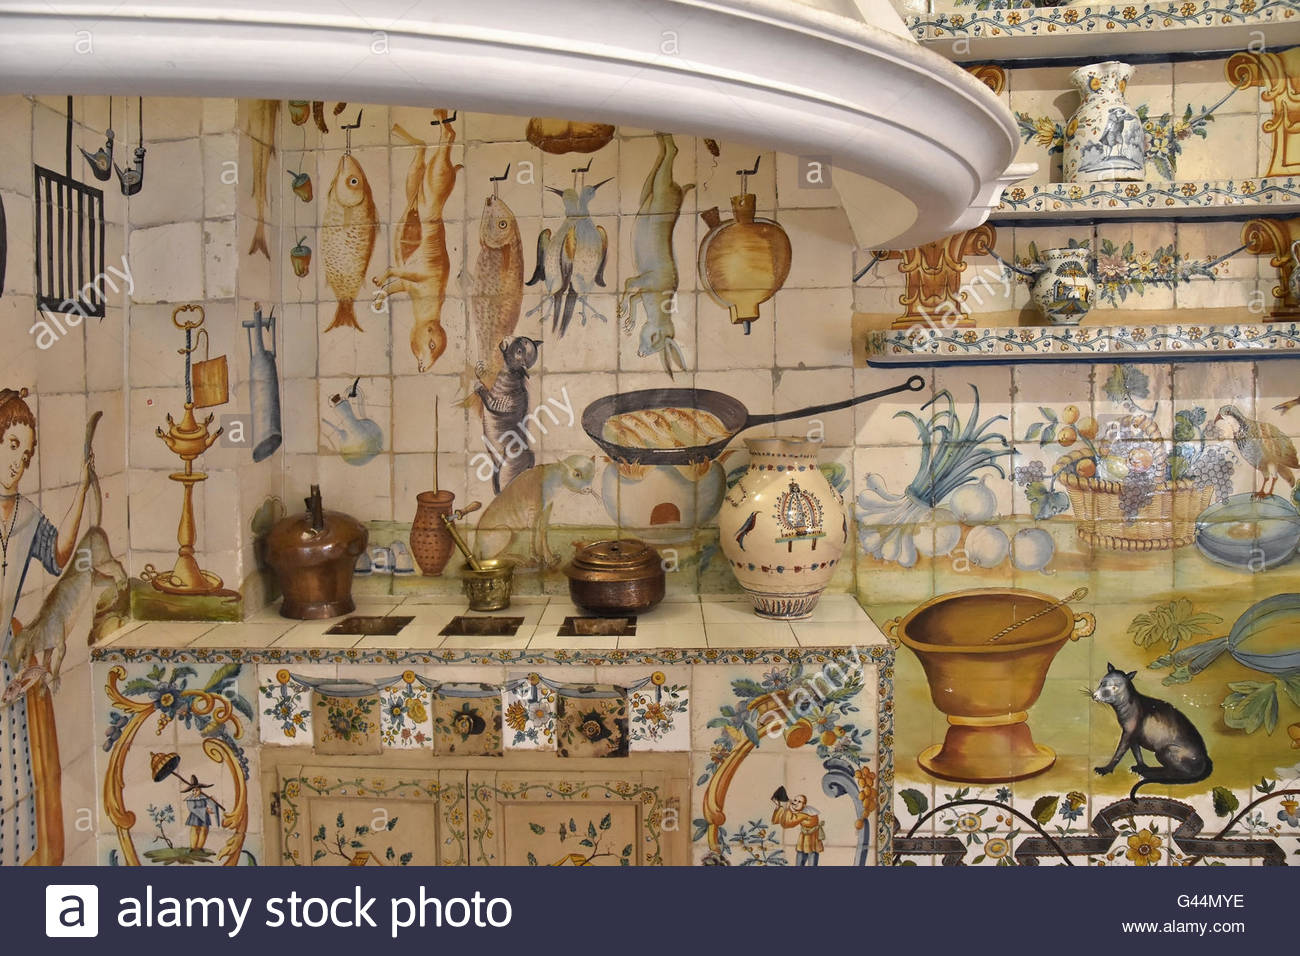 18th century valencian kitchen cocina valenciana ornate for Cocina valenciana